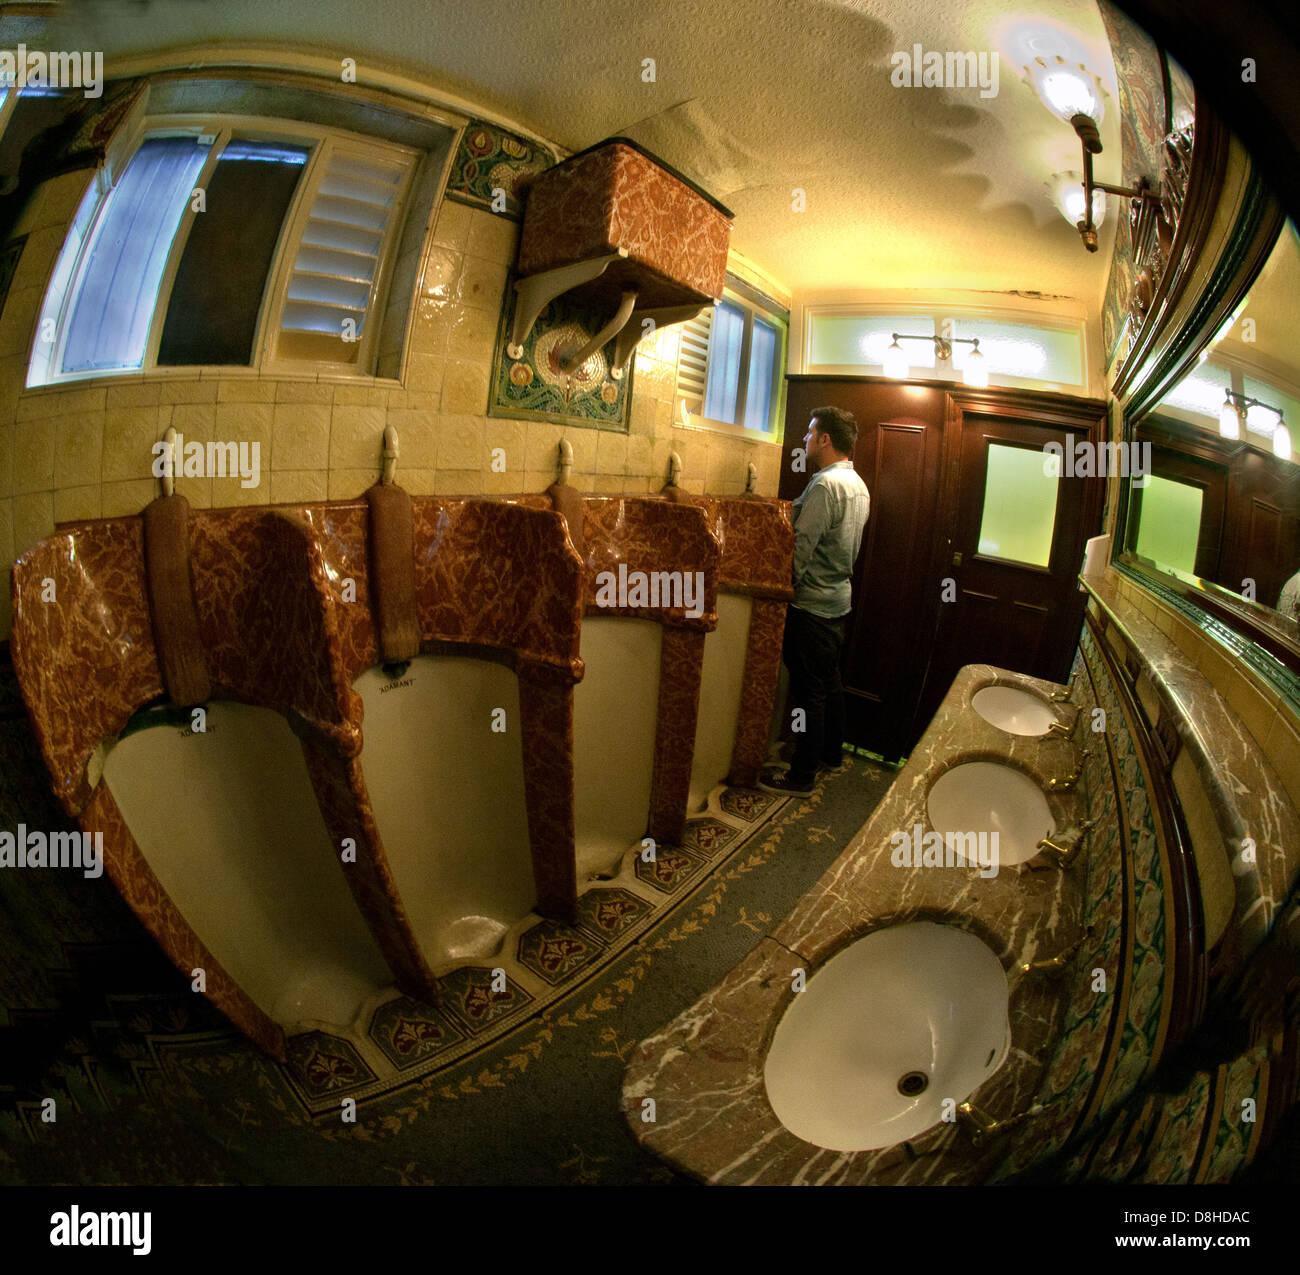 Laden Sie dieses Alamy Stockfoto Die berühmten Hope St Phillarmonic Pub Urinale, Liverpool England UK - D8HDAC